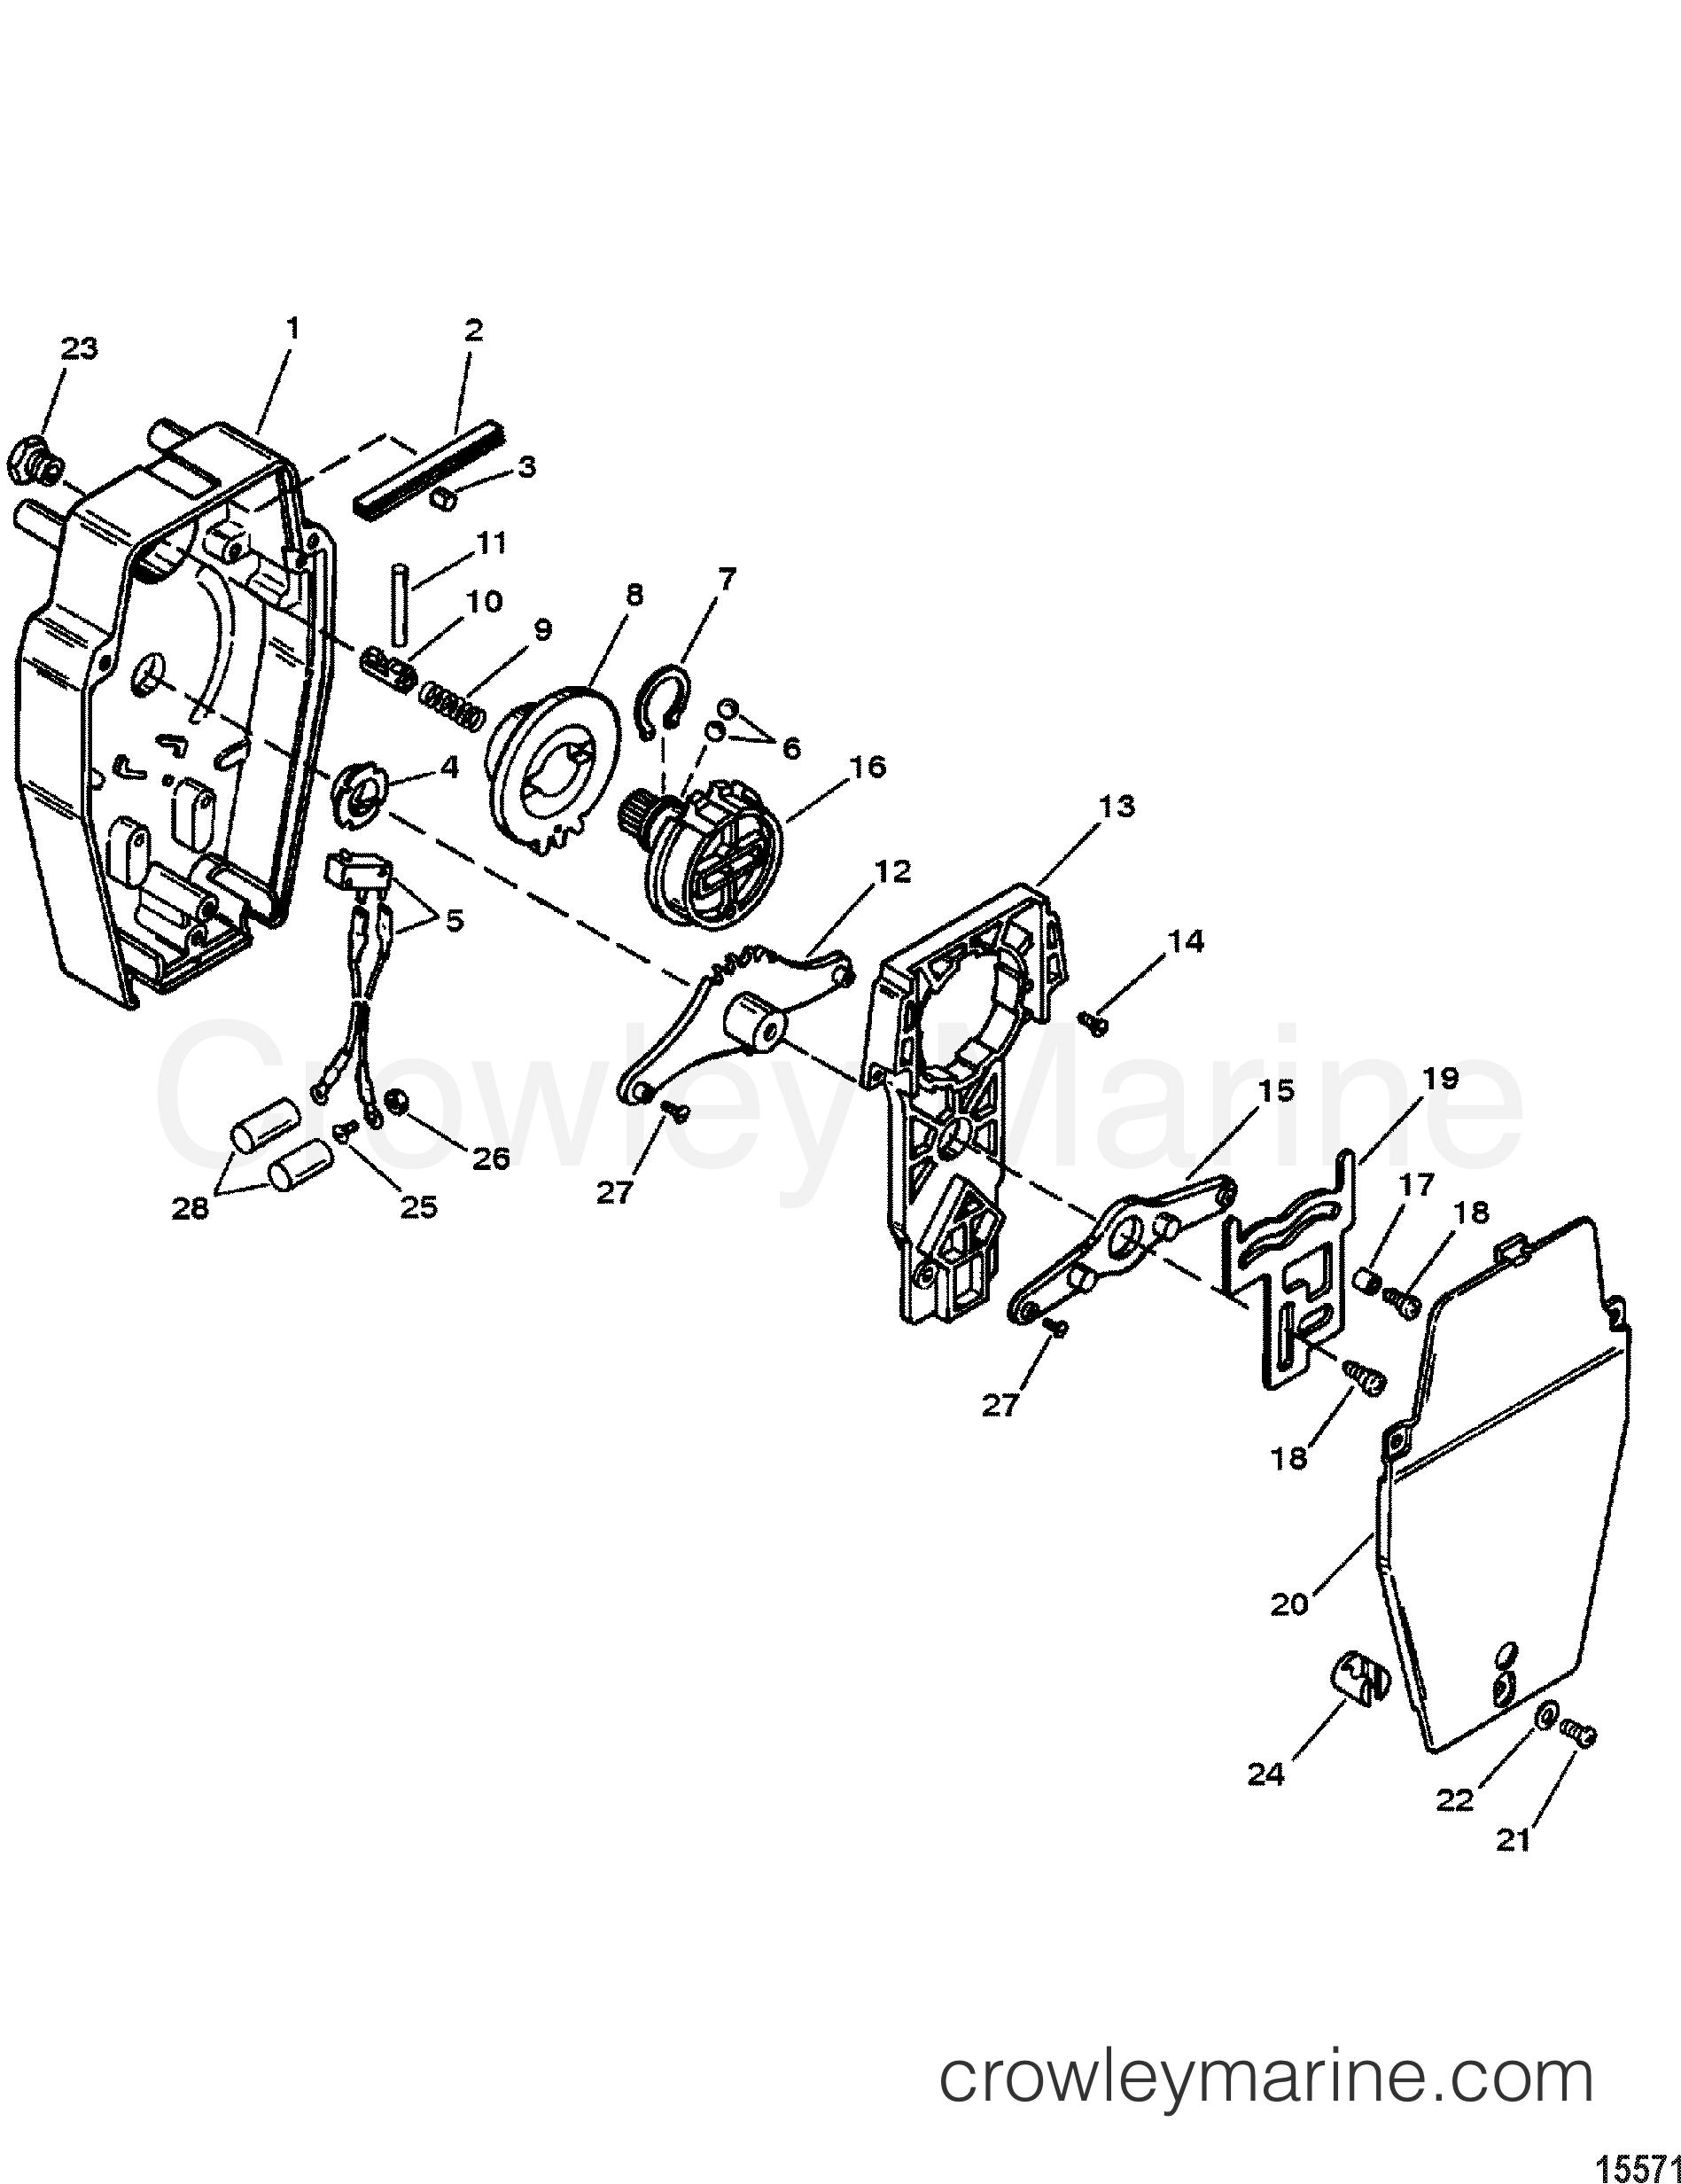 modular components design ii